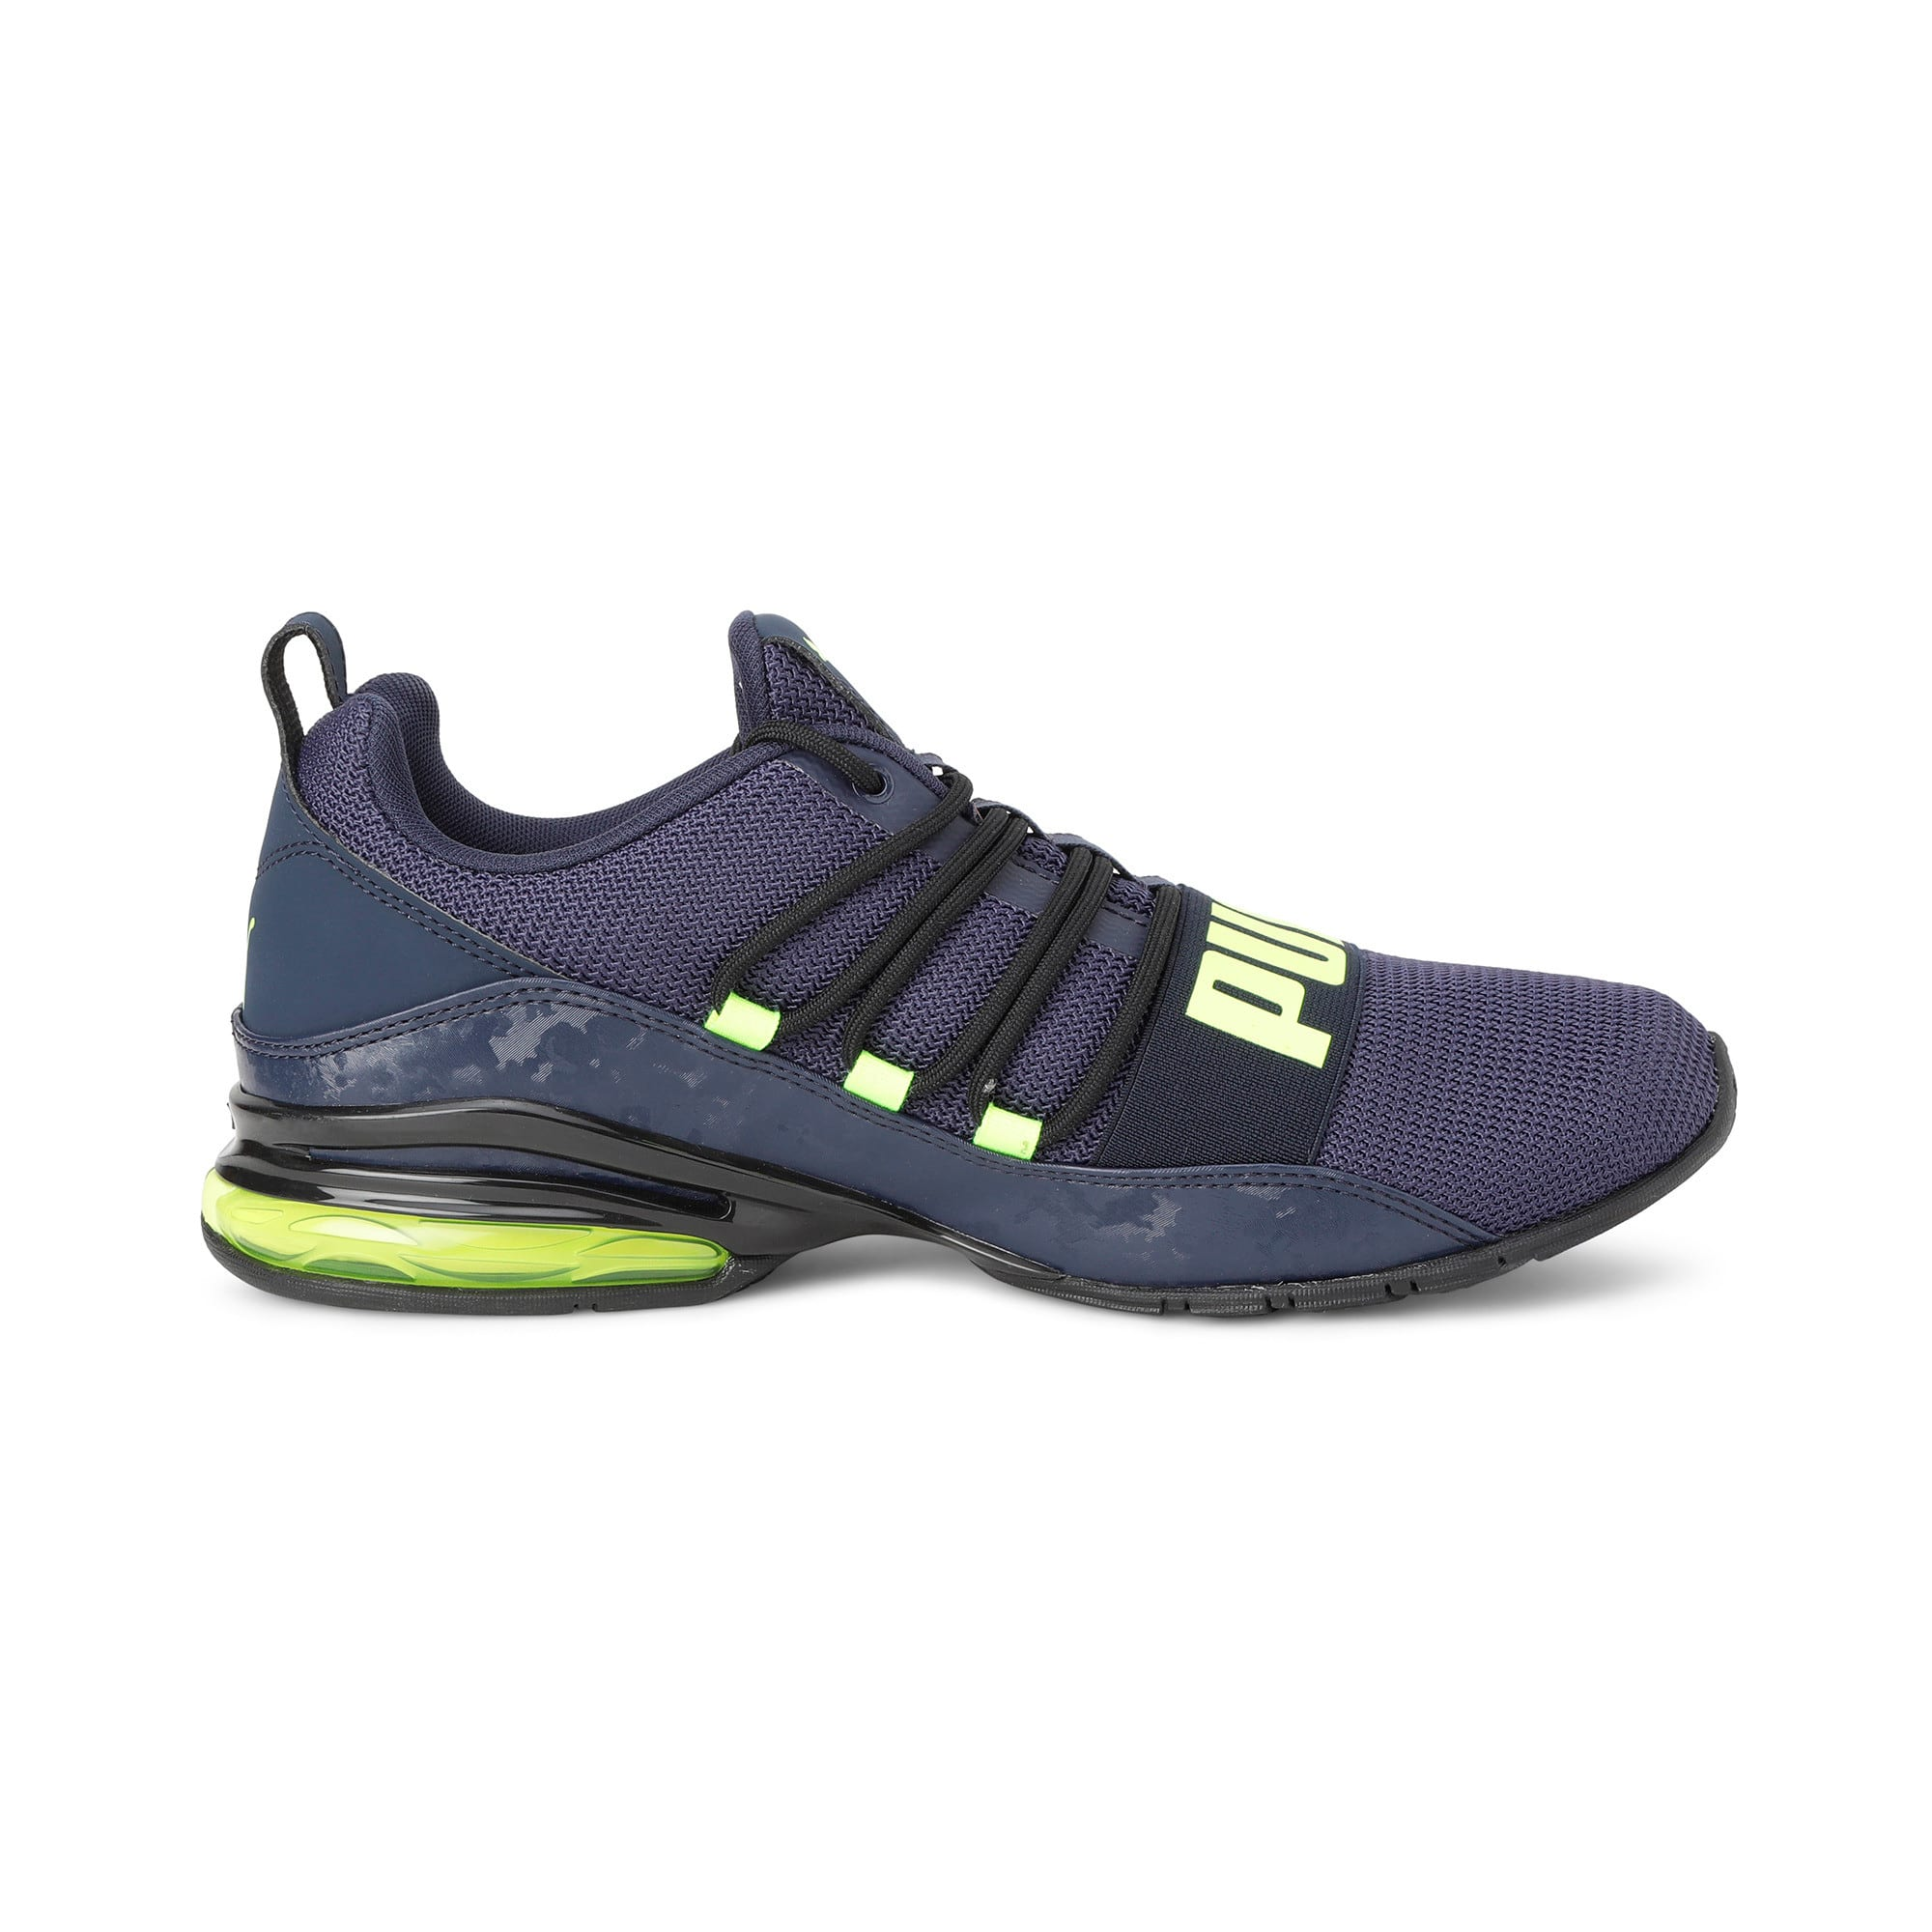 Thumbnail 7 of Cell Regulate Camo Men's Running Shoes, Peacoat-Yellow Alert, medium-IND